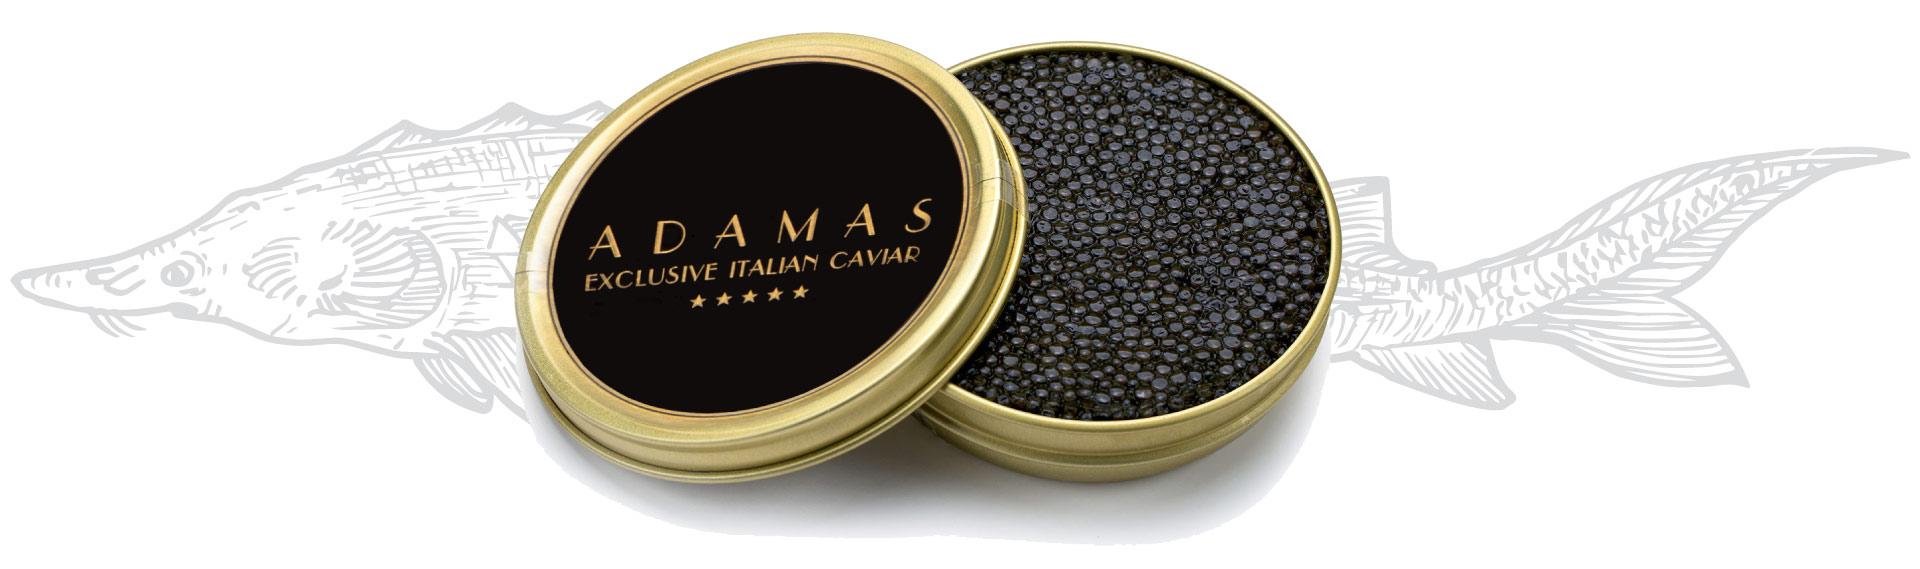 Adamas Caviar - Login